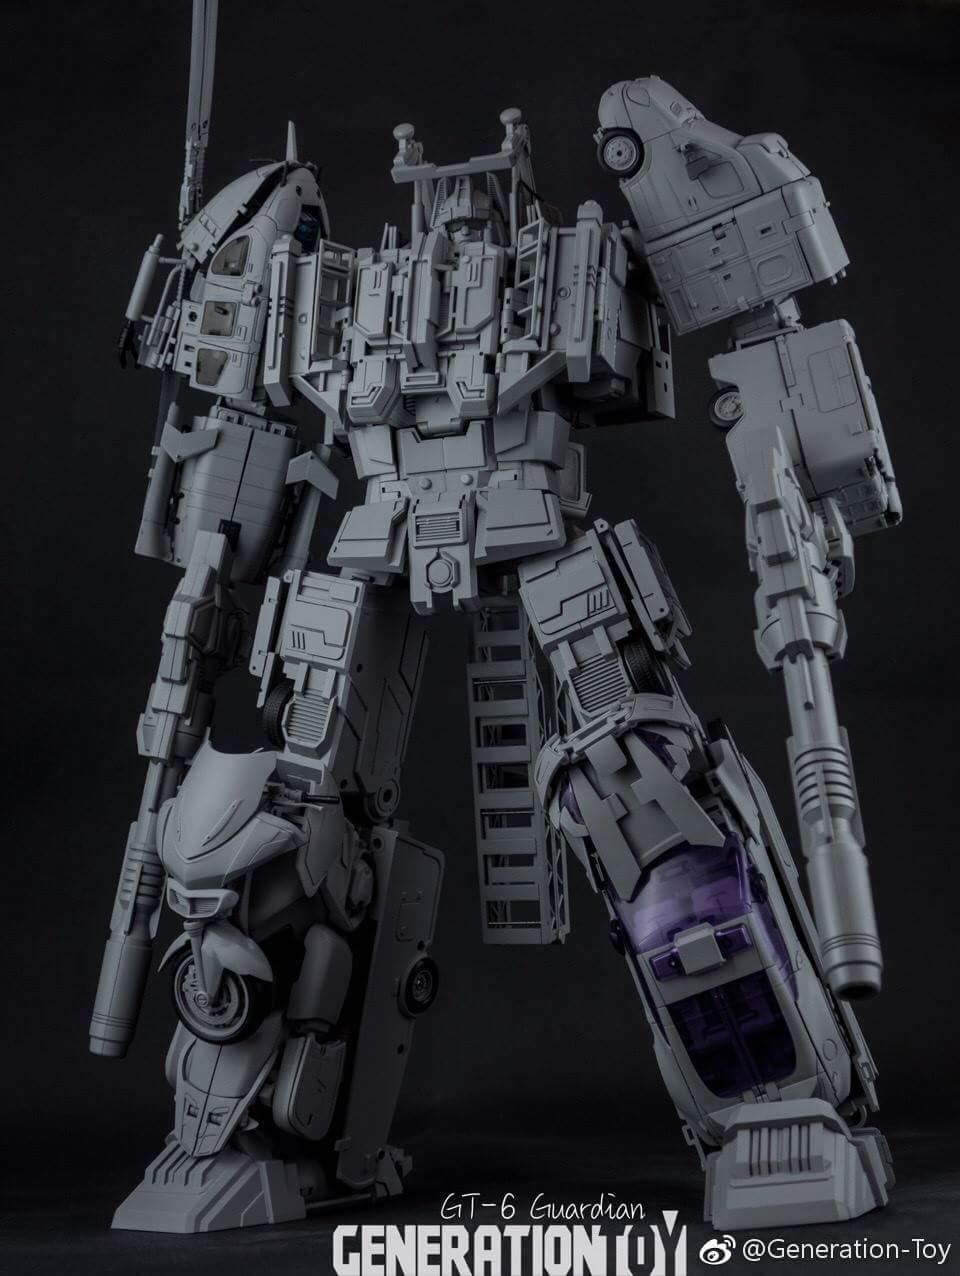 [Generation Toy] Produit Tiers - Jouet GT-08 Guardian - aka Defensor/Defenso QYV4Sbr4_o